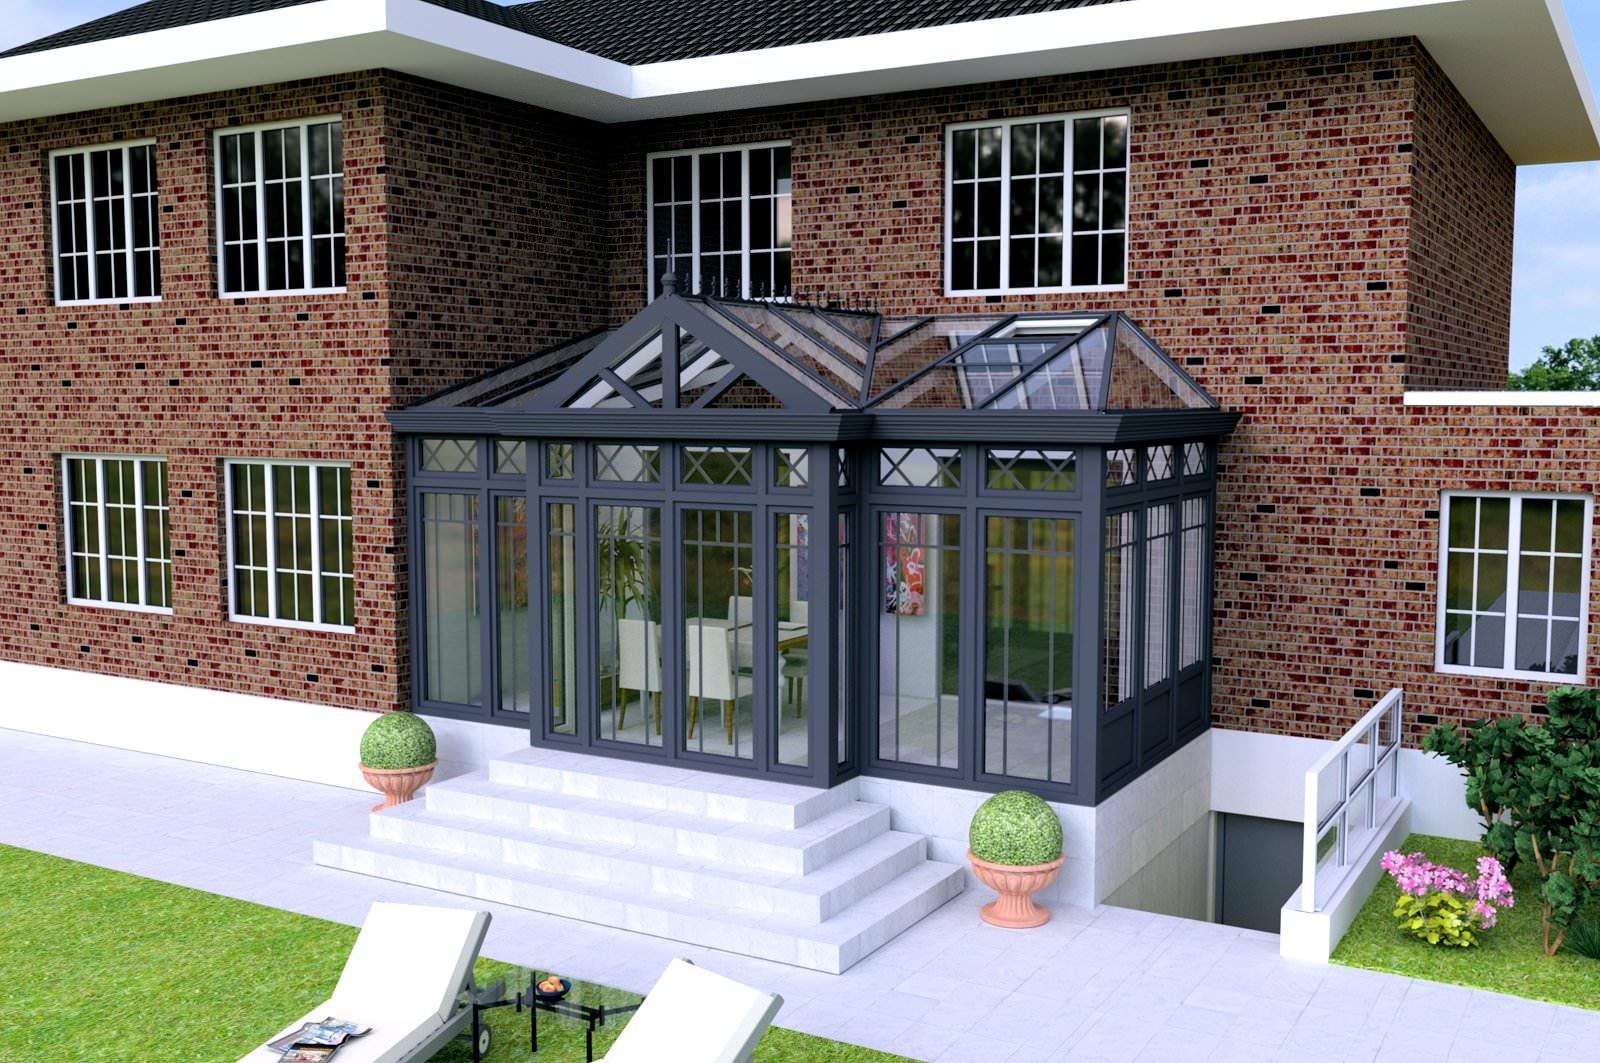 wintergarten ideen kleiner wintergarten ideen f r die. Black Bedroom Furniture Sets. Home Design Ideas